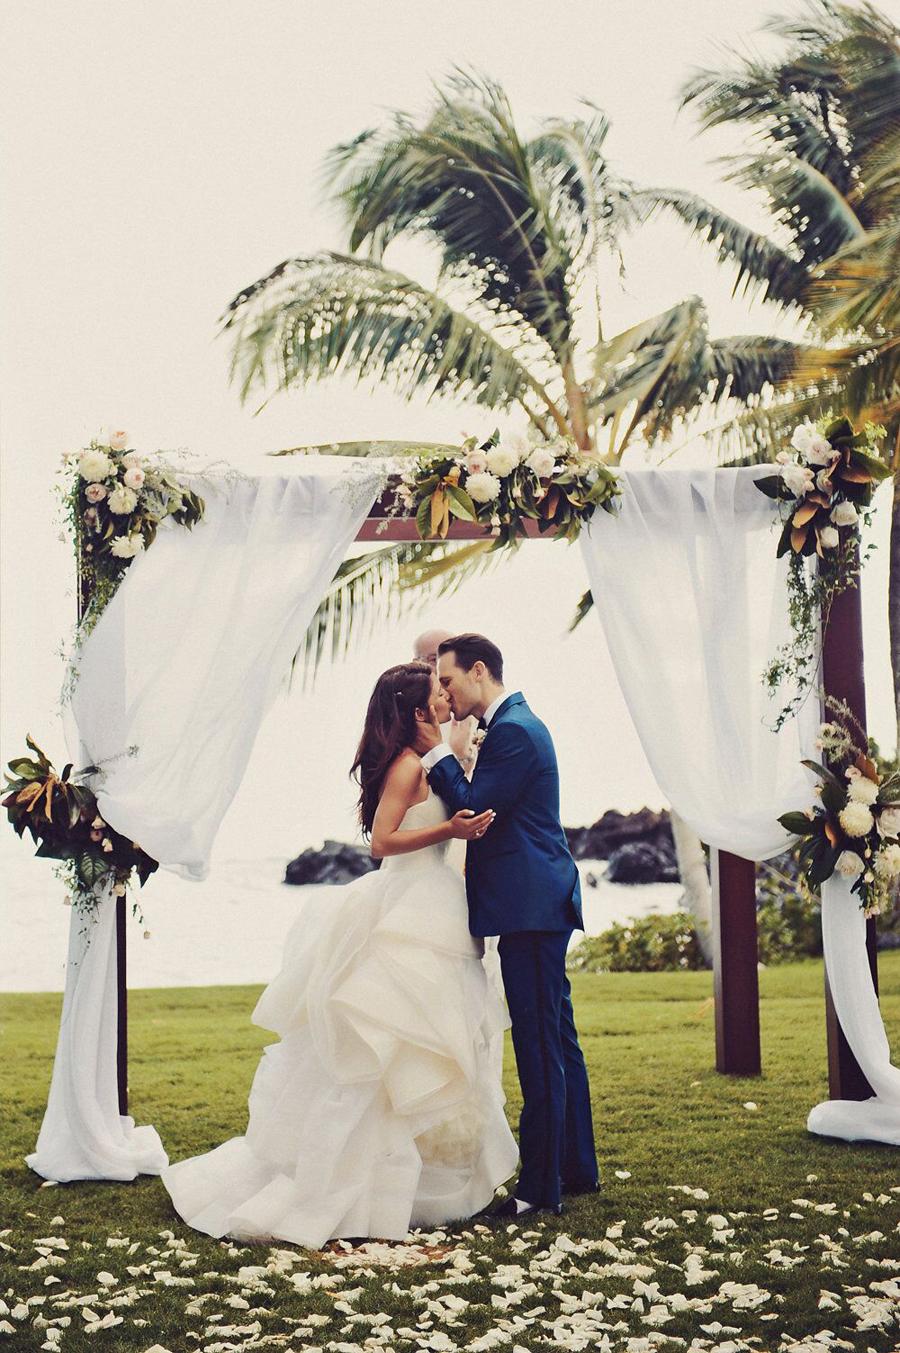 Floral, Floral Design, Blooms, Wedding, Wedding Day, Wedding Ceremony, Ceremony